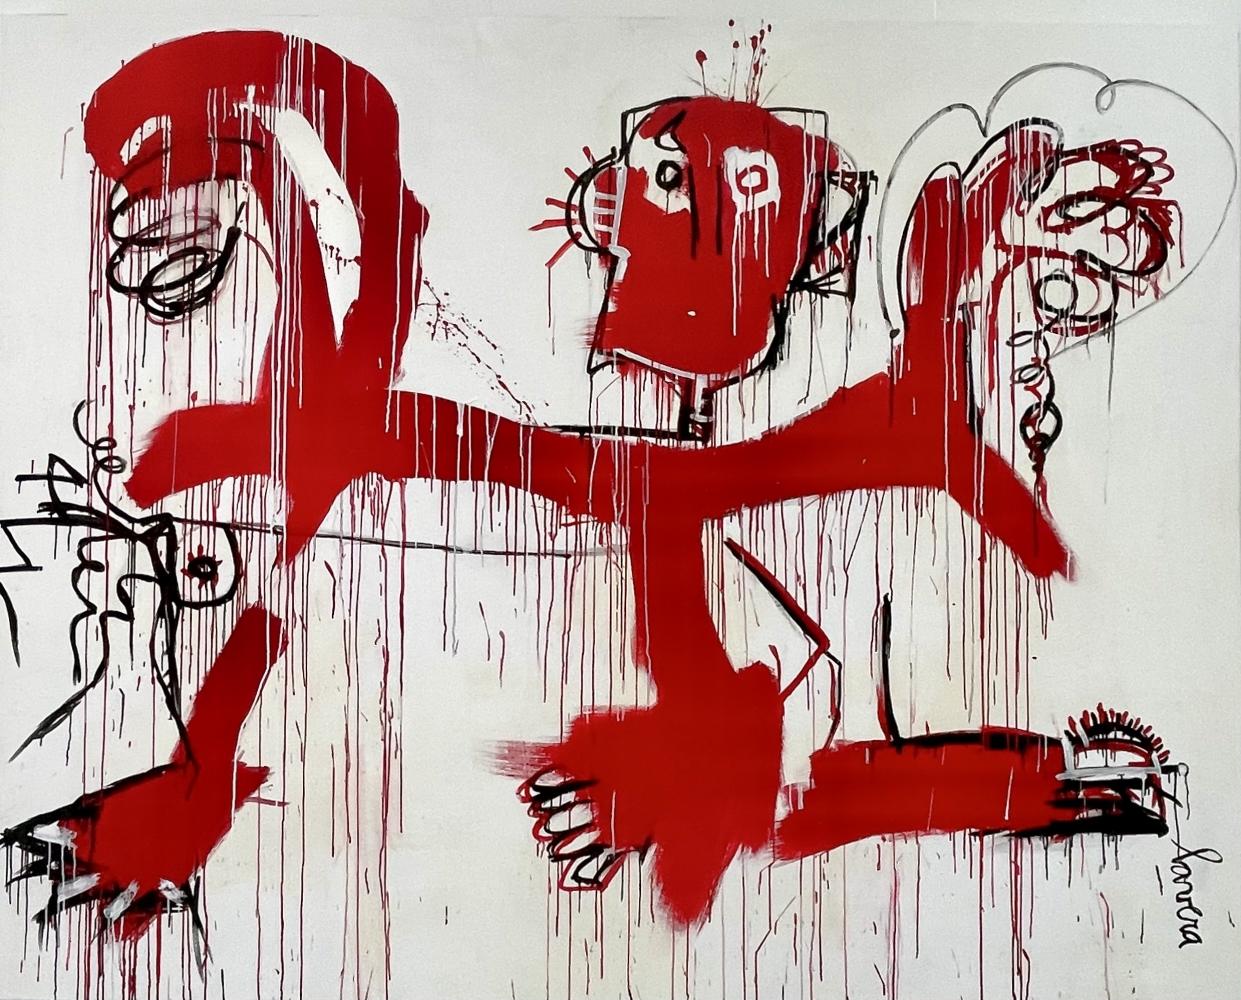 Fernanda Lavera, Danza con el Diablo, 2019, acrylic painting on canvas, graffiti and street art For sale at Manolis Projects Gallery, Miami. FL